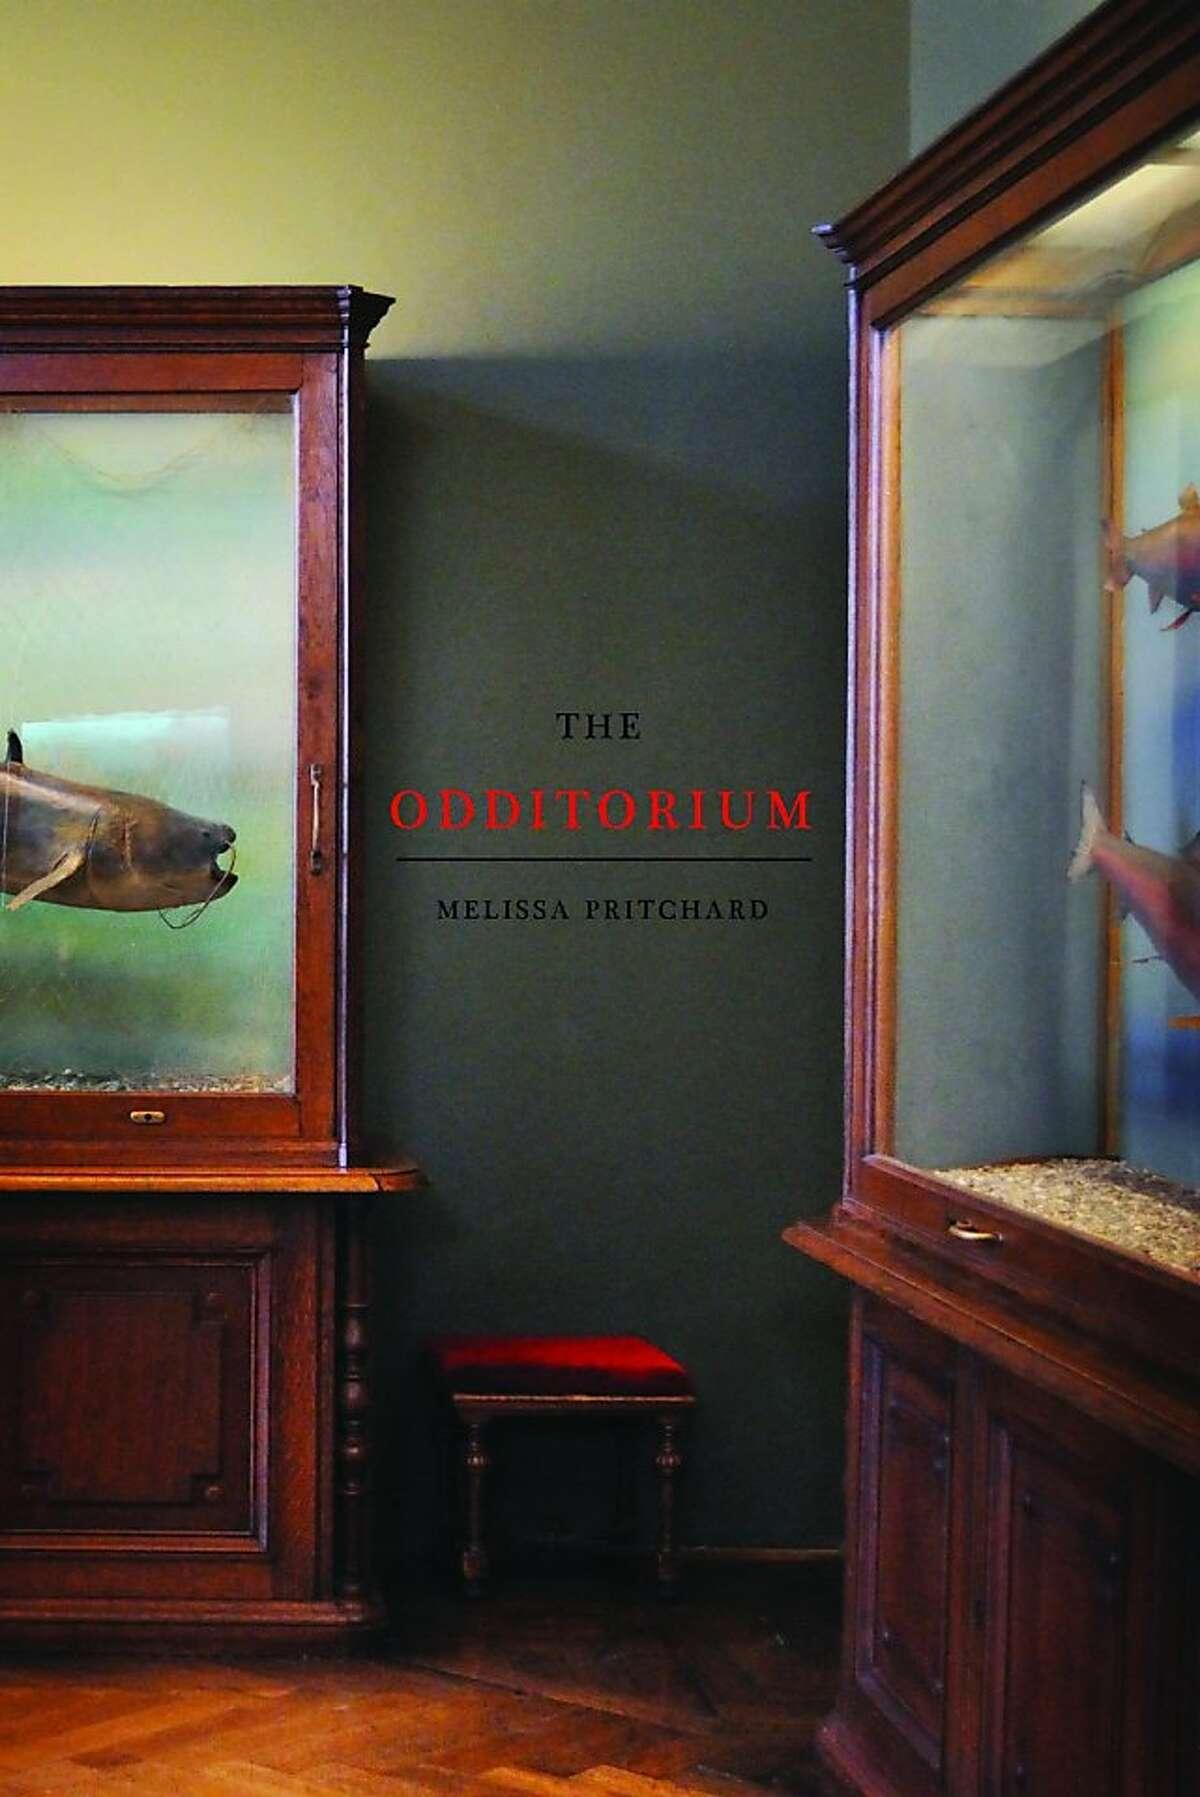 """Odditorium"" by Melissa Pritchard"